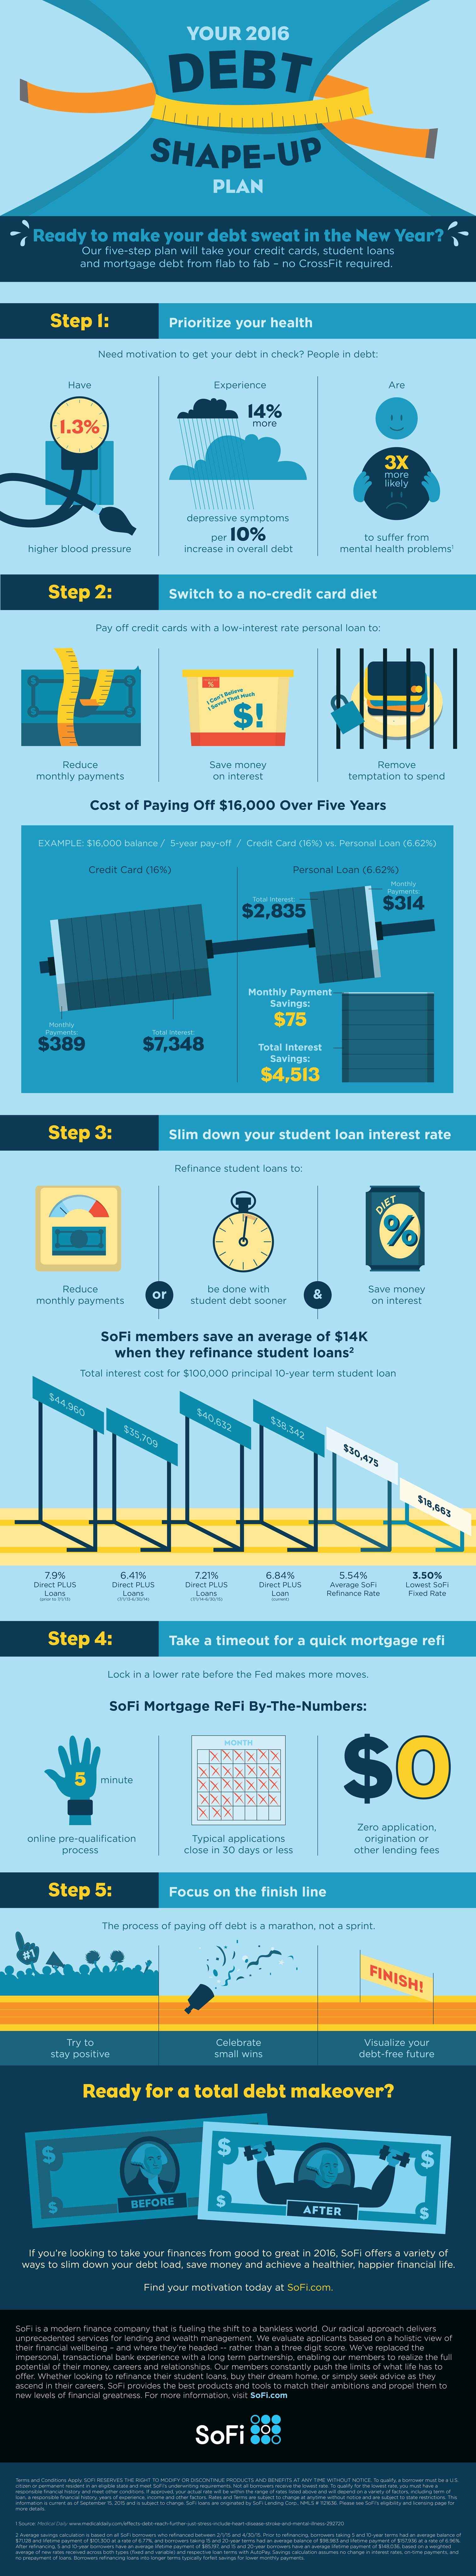 2016 Debt Diet Infographic